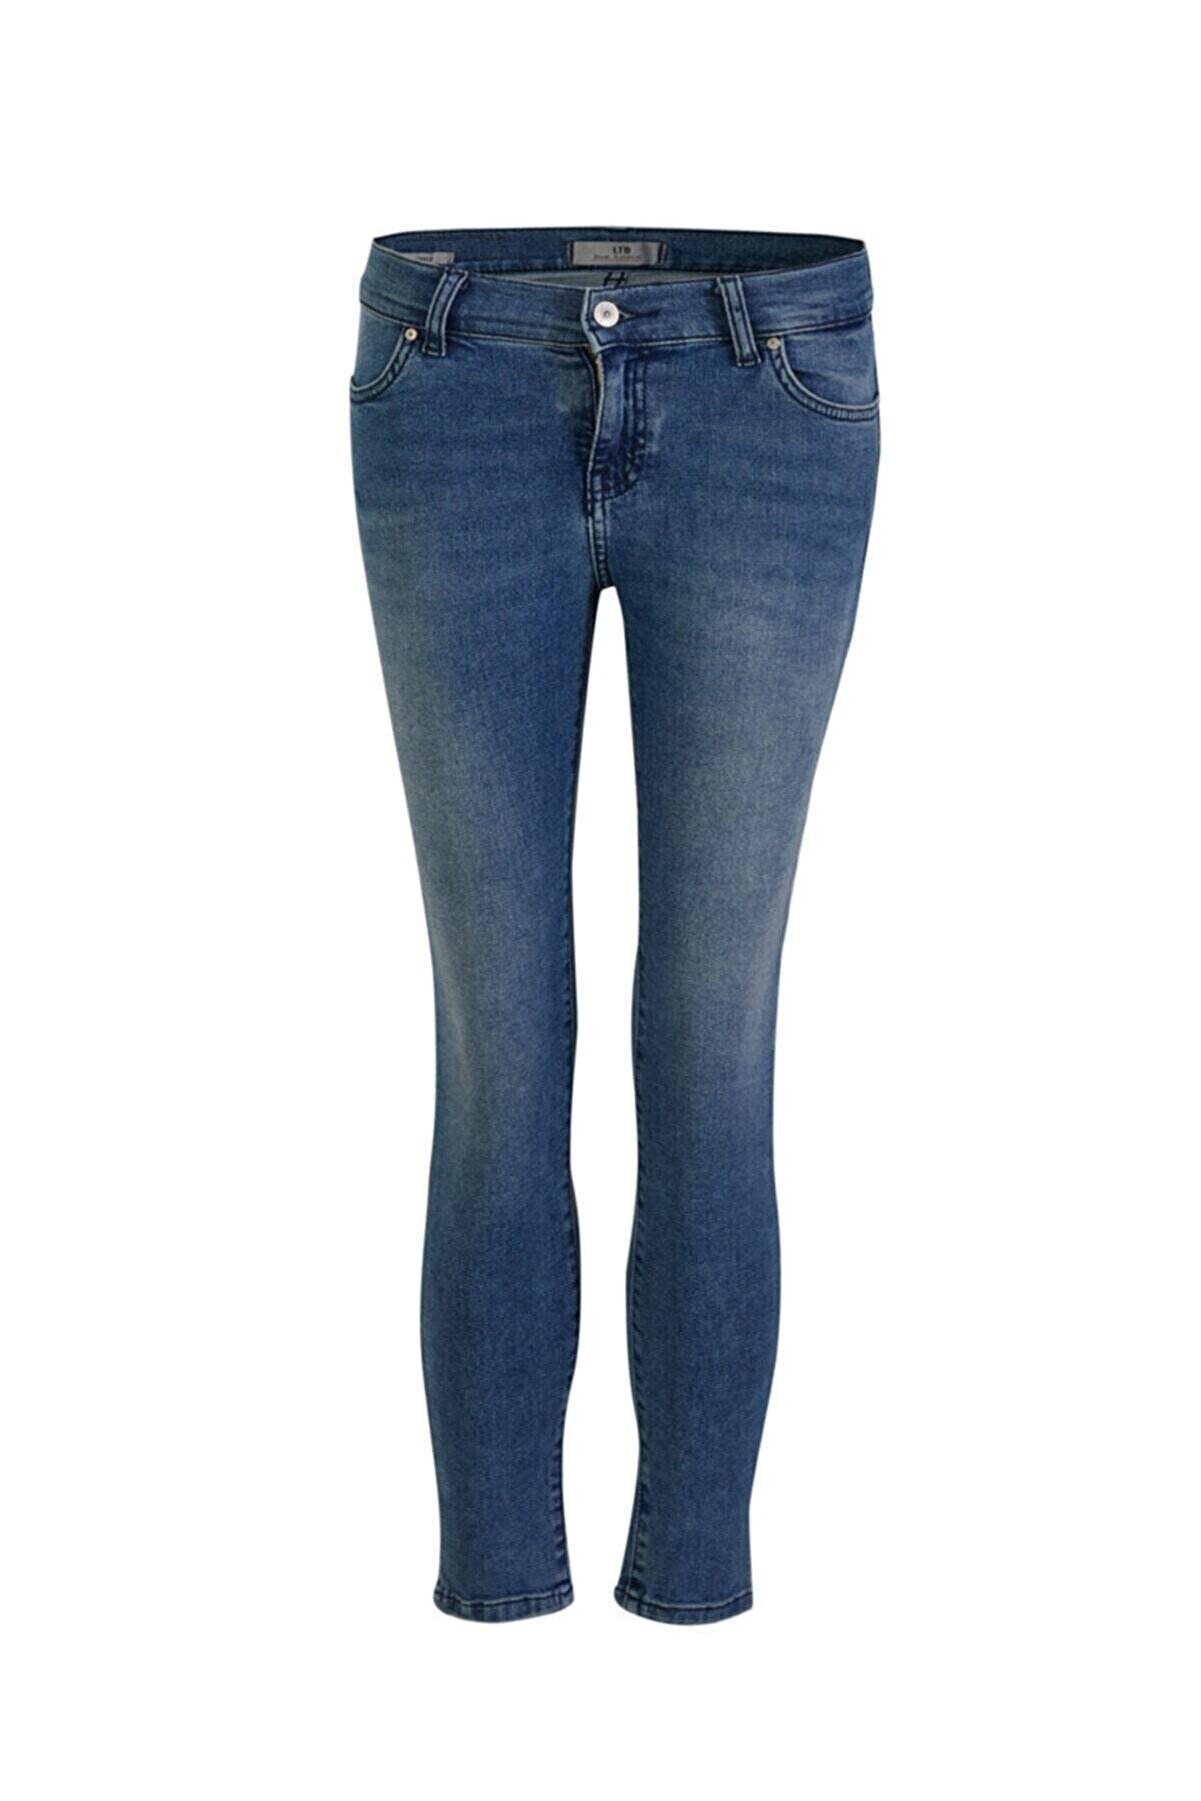 Ltb Kadın Lonıa Super Skinny Jean Pantolon-01009510321468553040